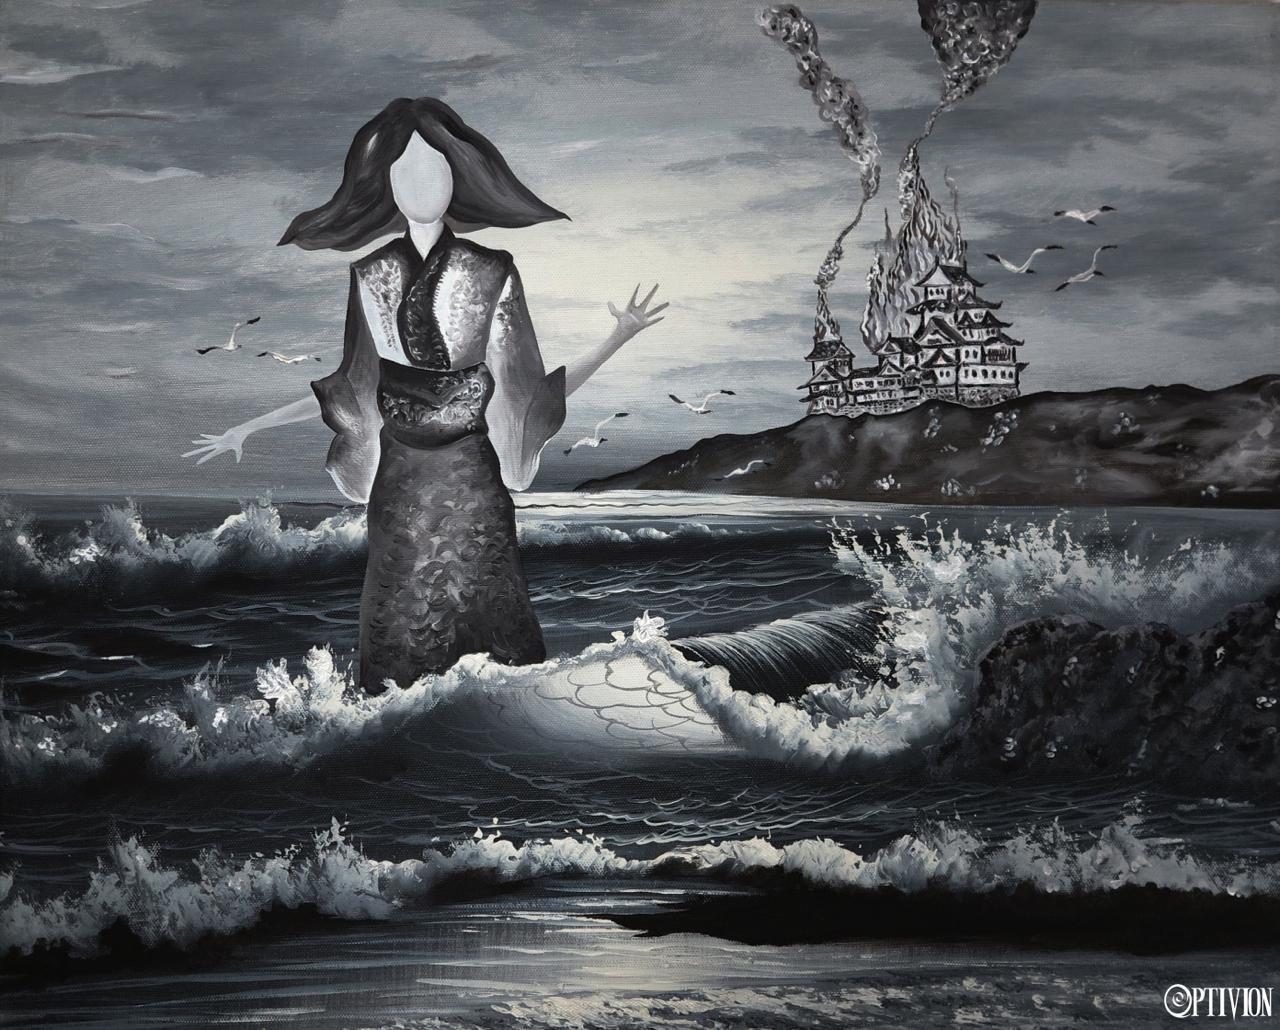 Optivion - Oil on canvas - Japan is burning